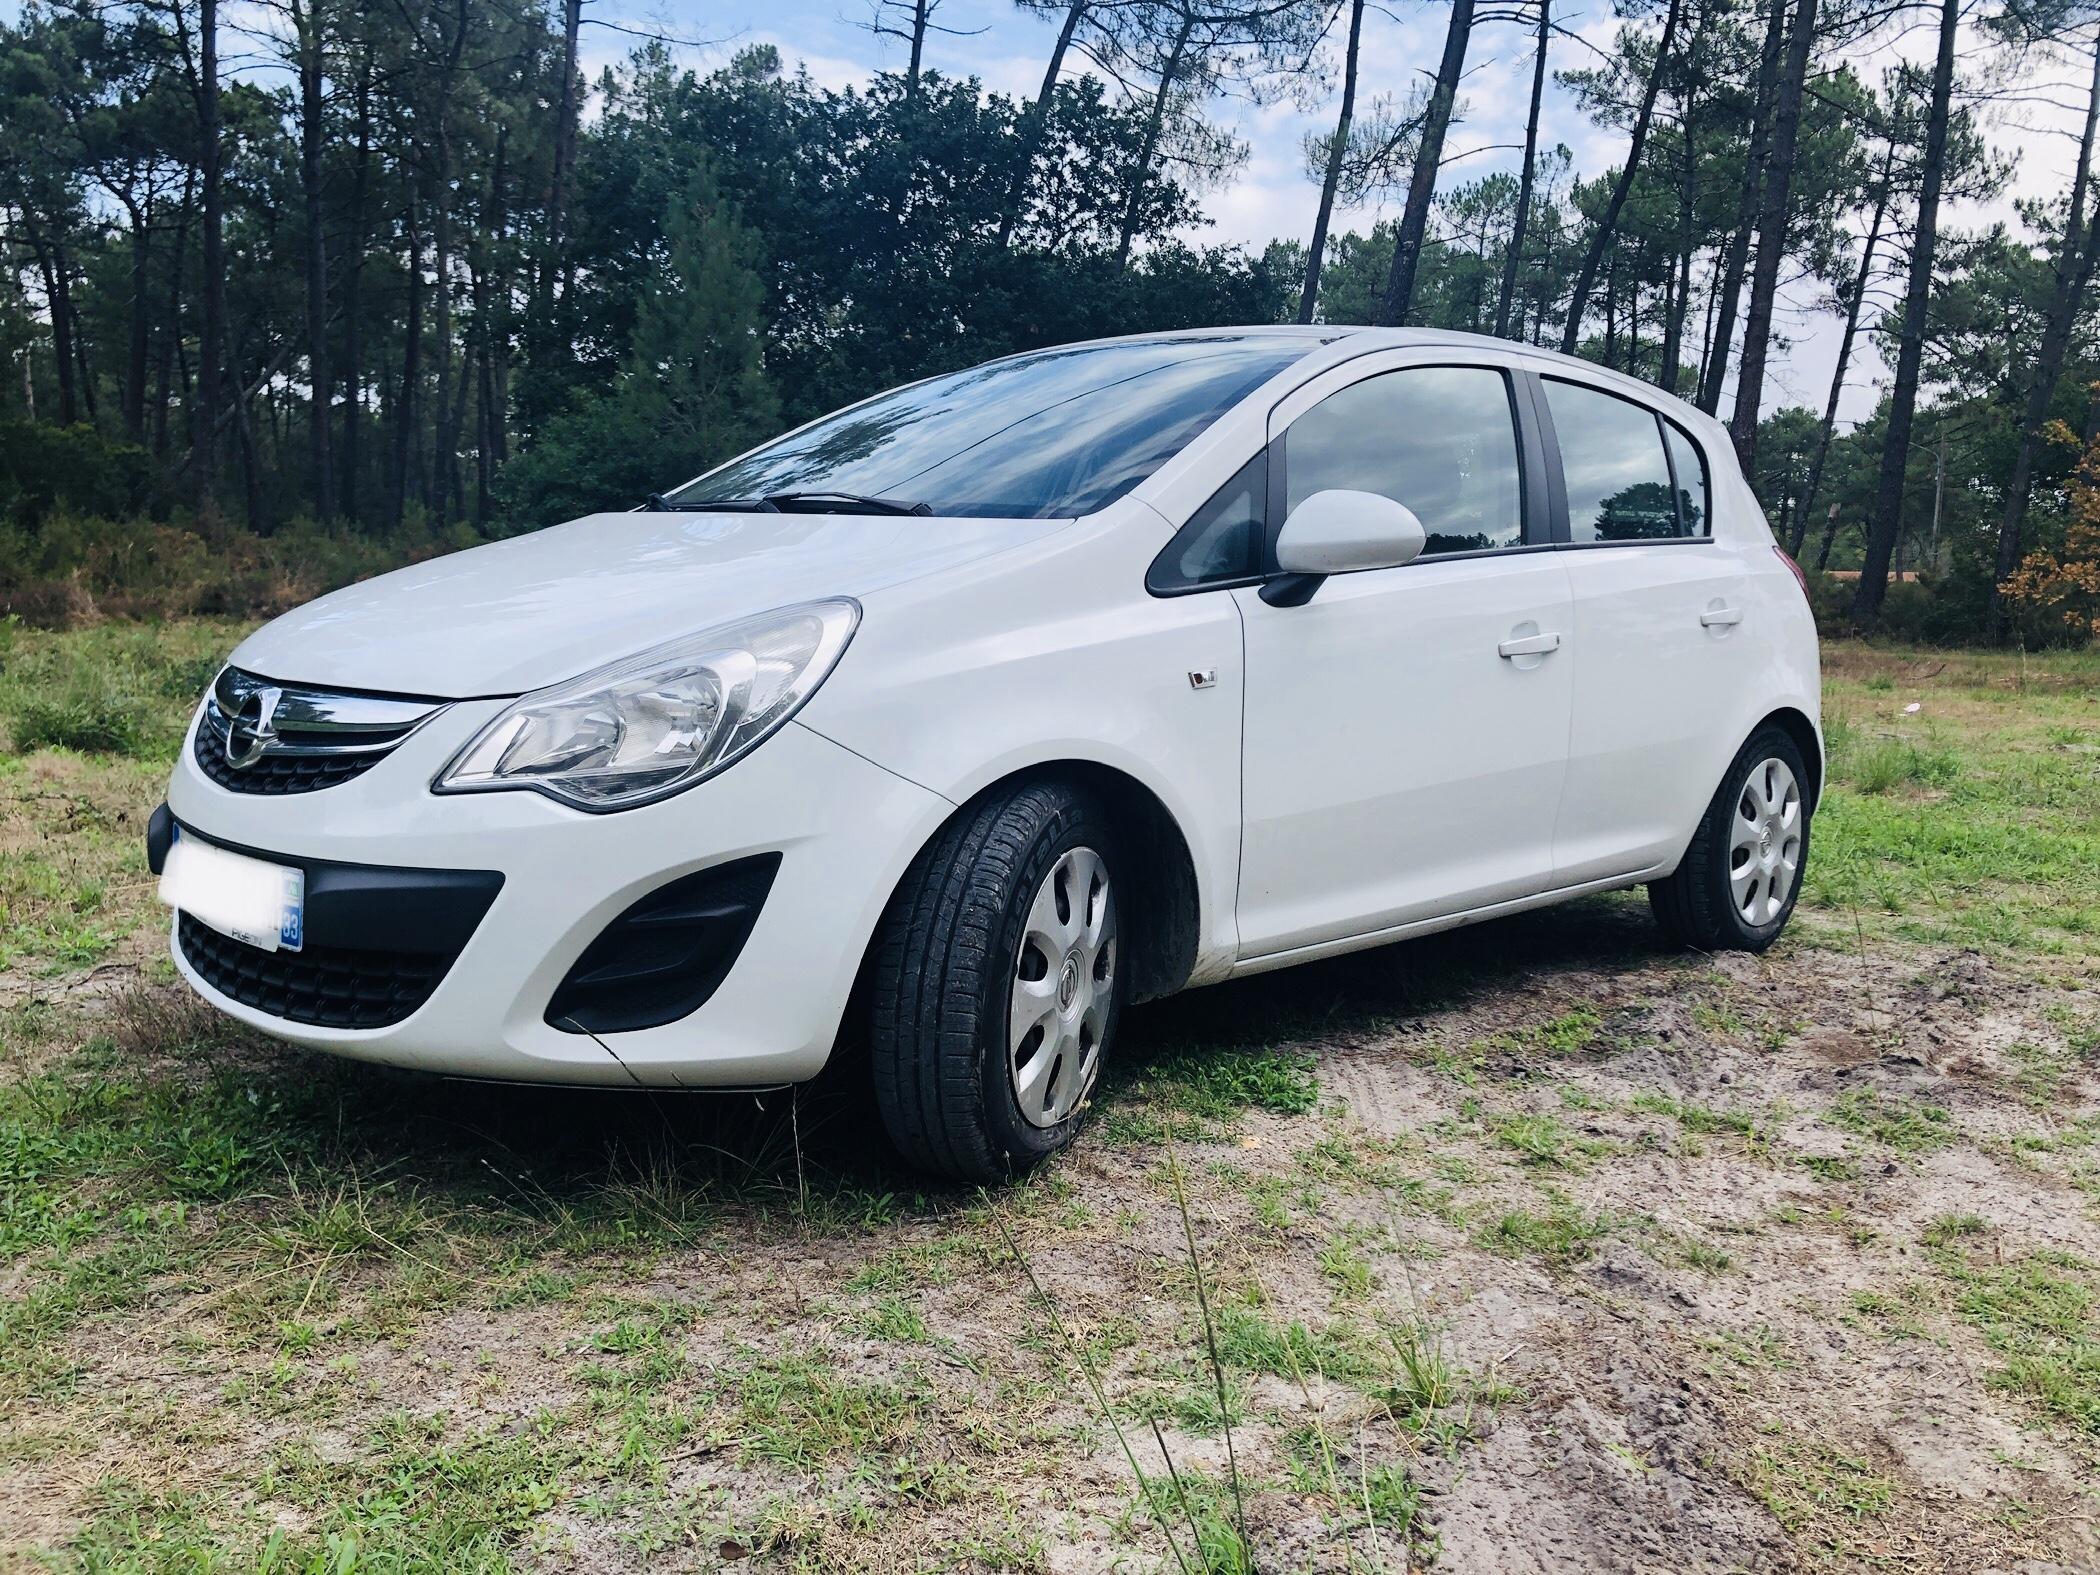 A vendre Opel CORSA 5P diesel